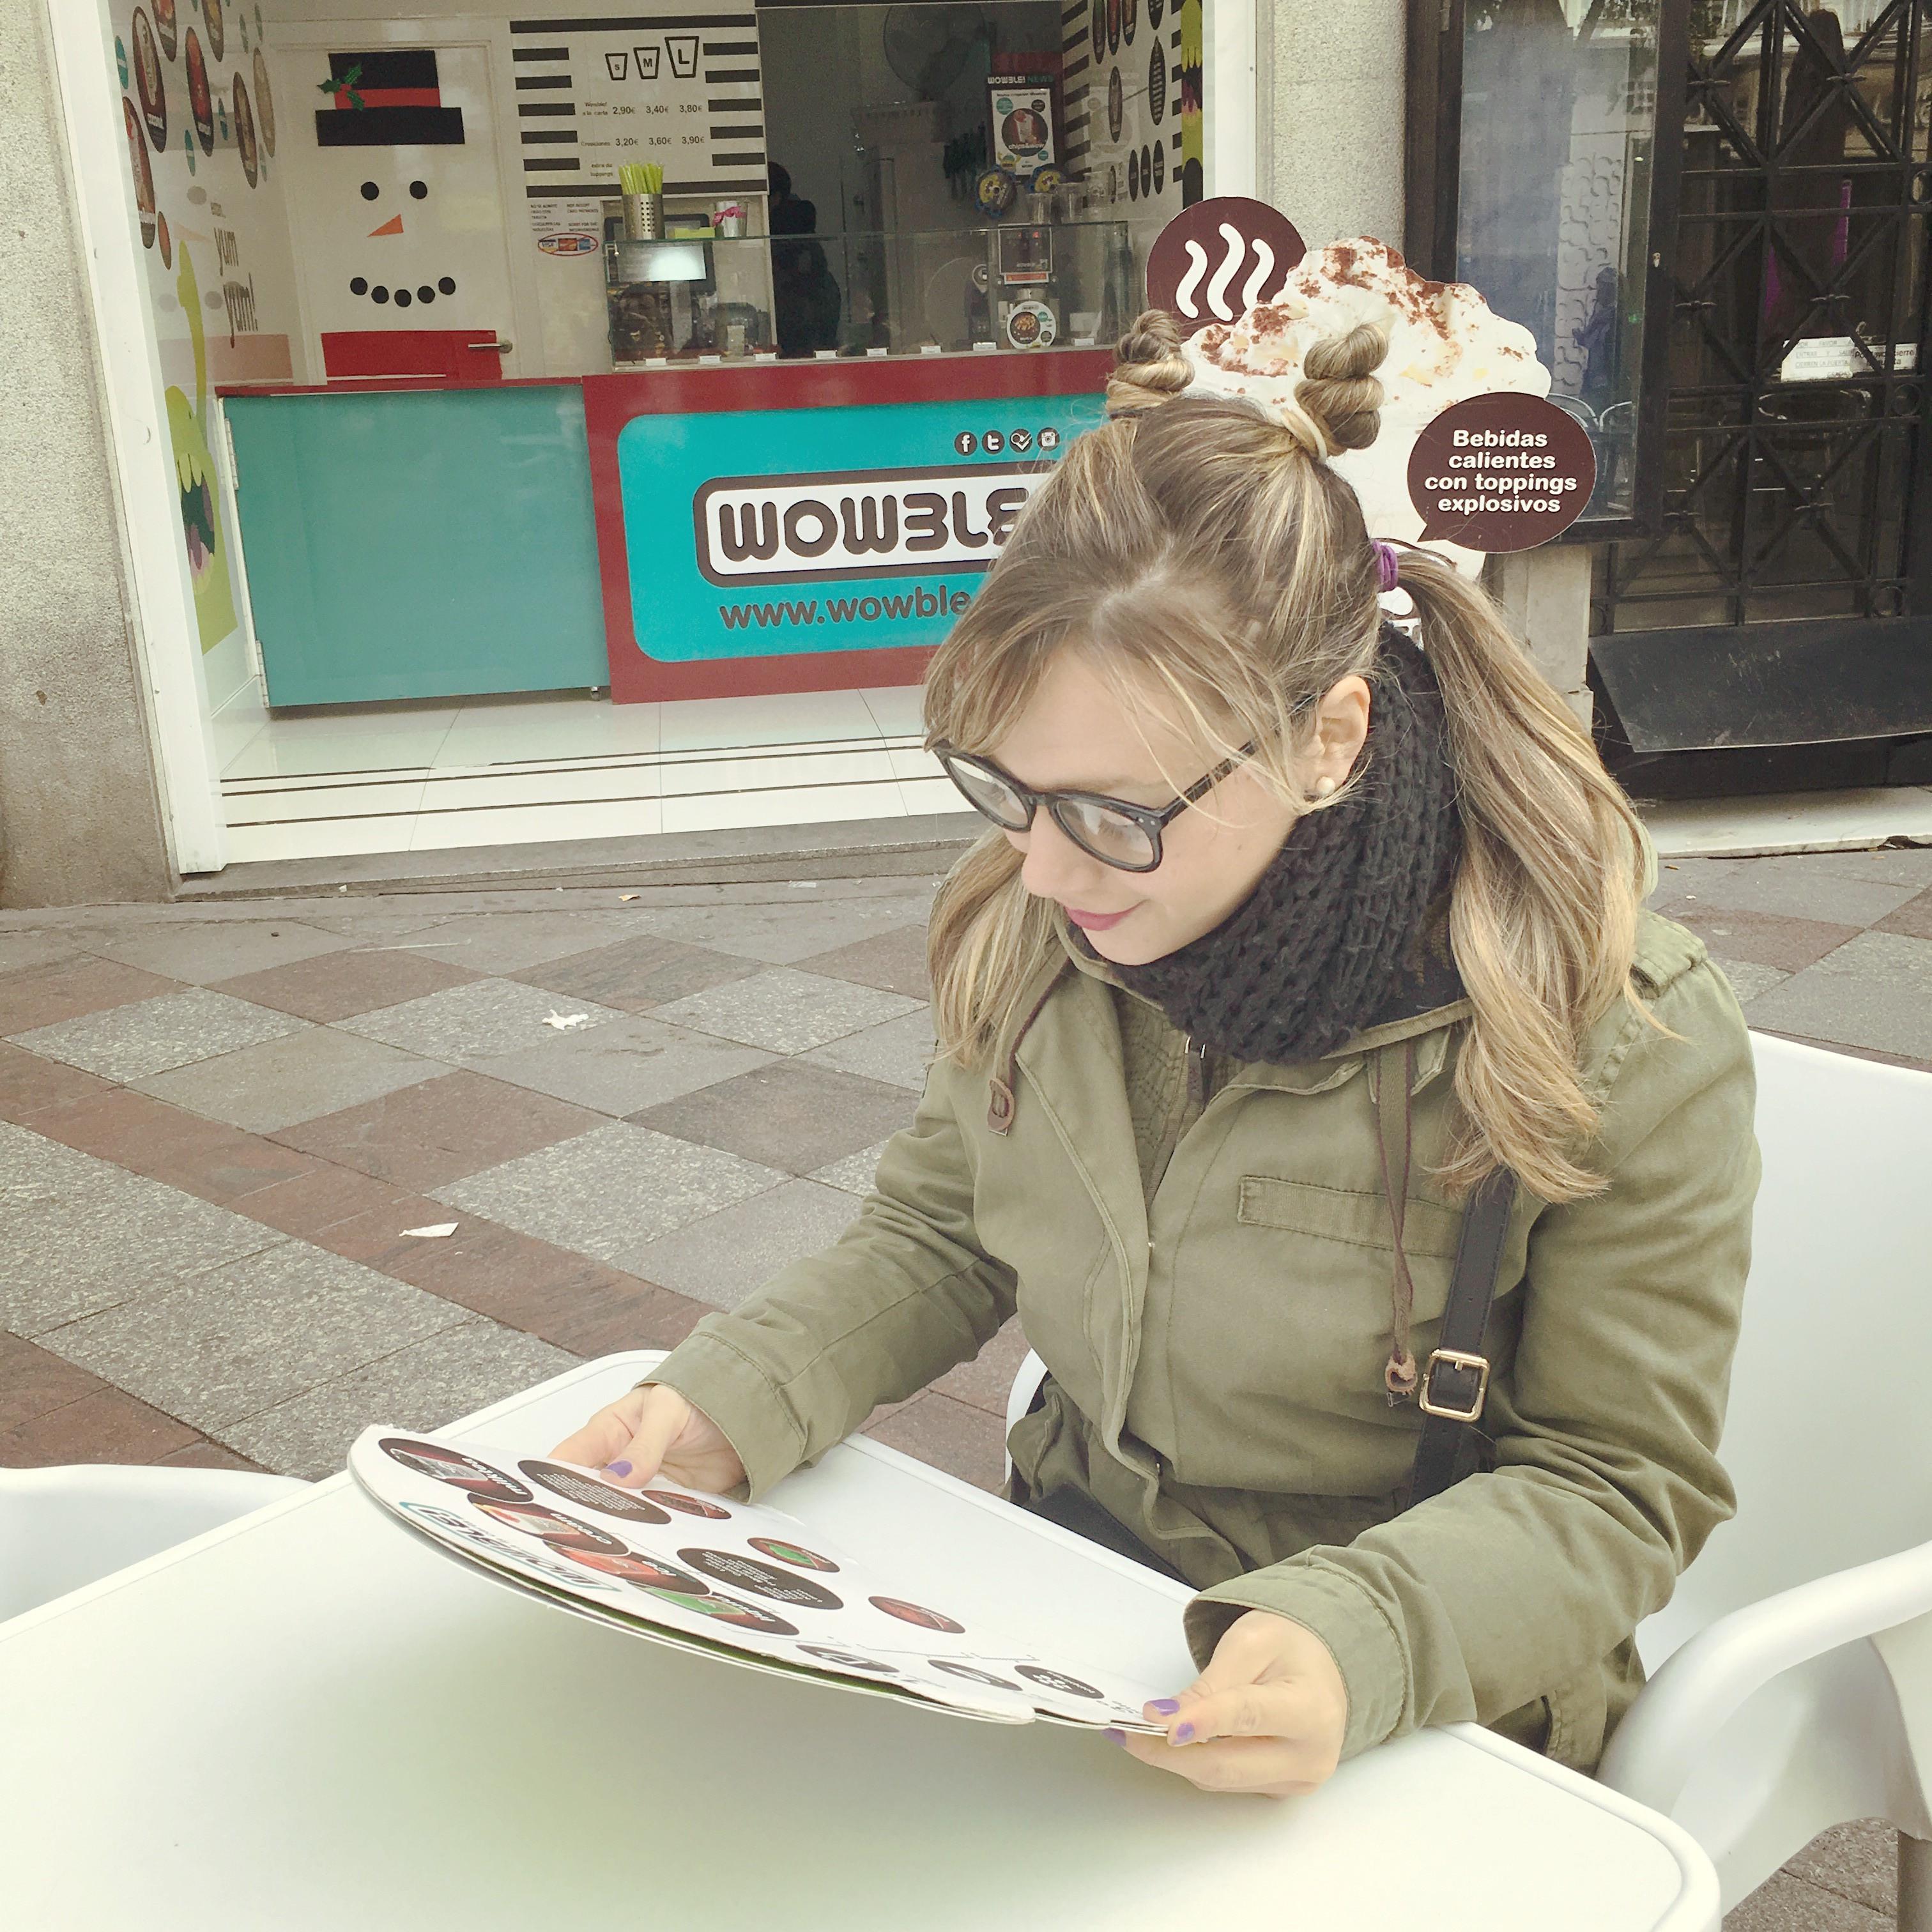 Blog-de-moda-ChicAdicta-Wowble-Madrid-Chic-Adicta-fashionista-bubble-tea-drink-fashionista-cute-style-PiensaenChic-Piensa-en-Chic